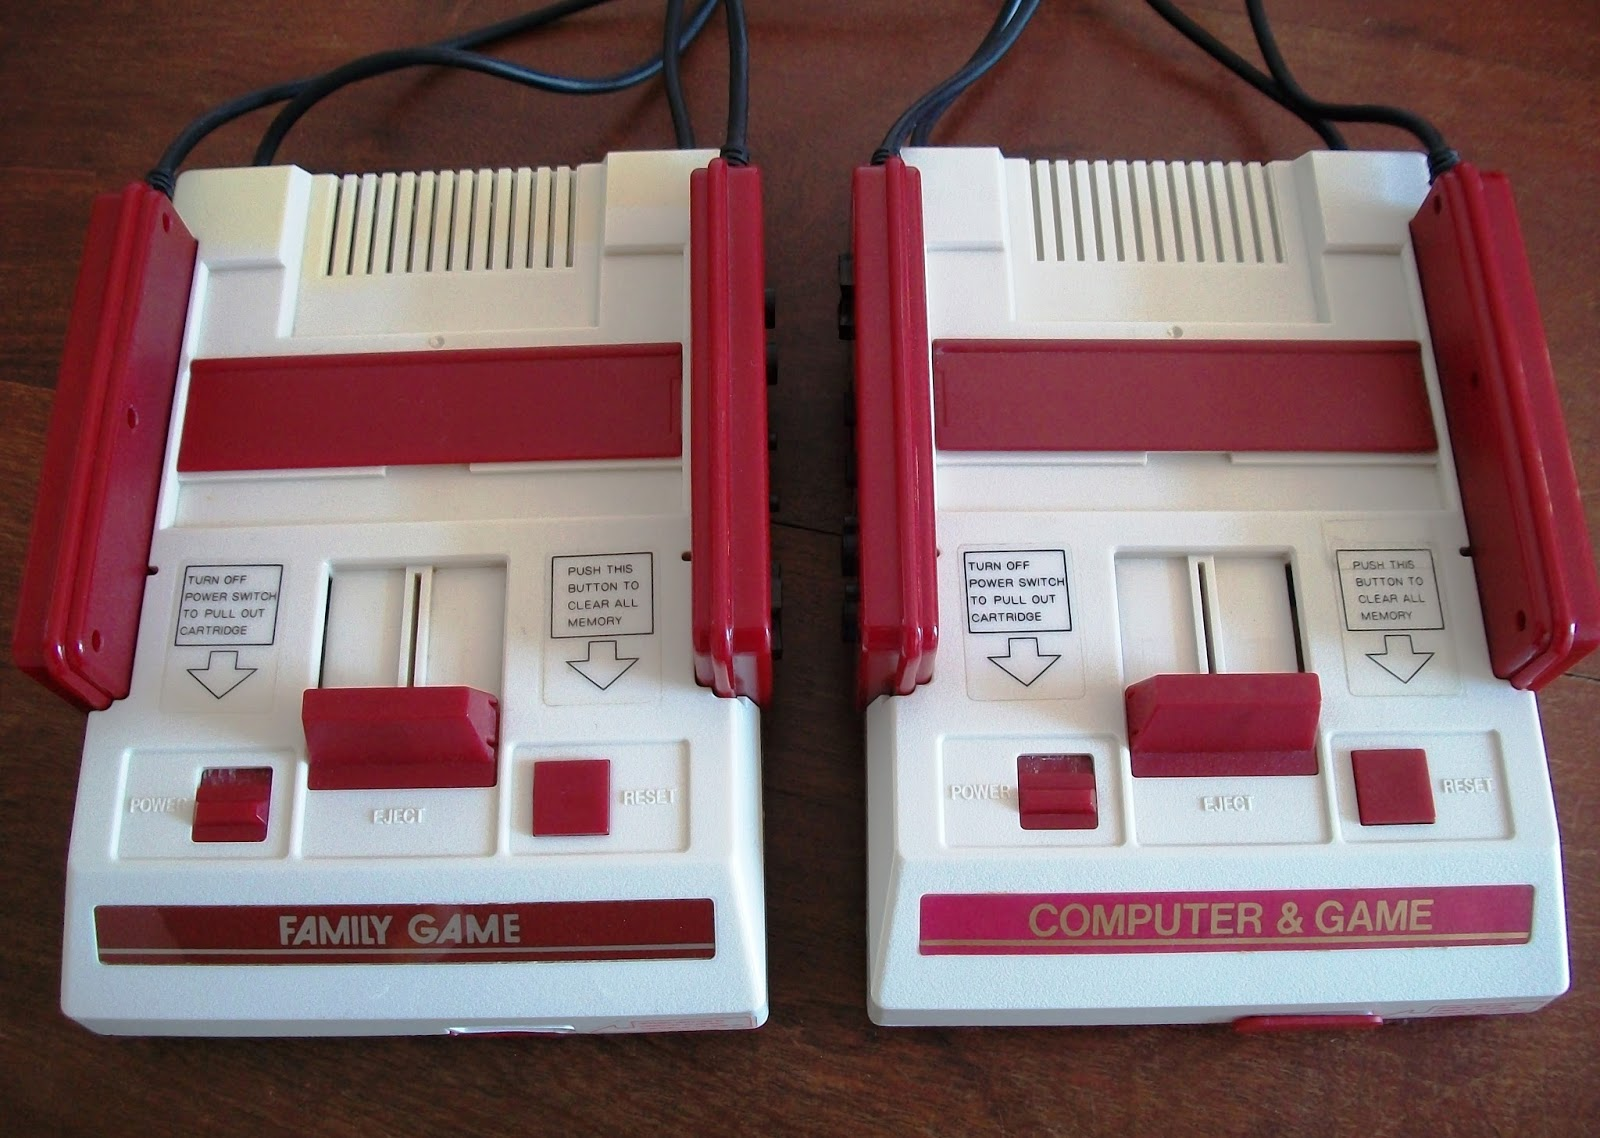 Family Cba Consola Family Game Ntdec